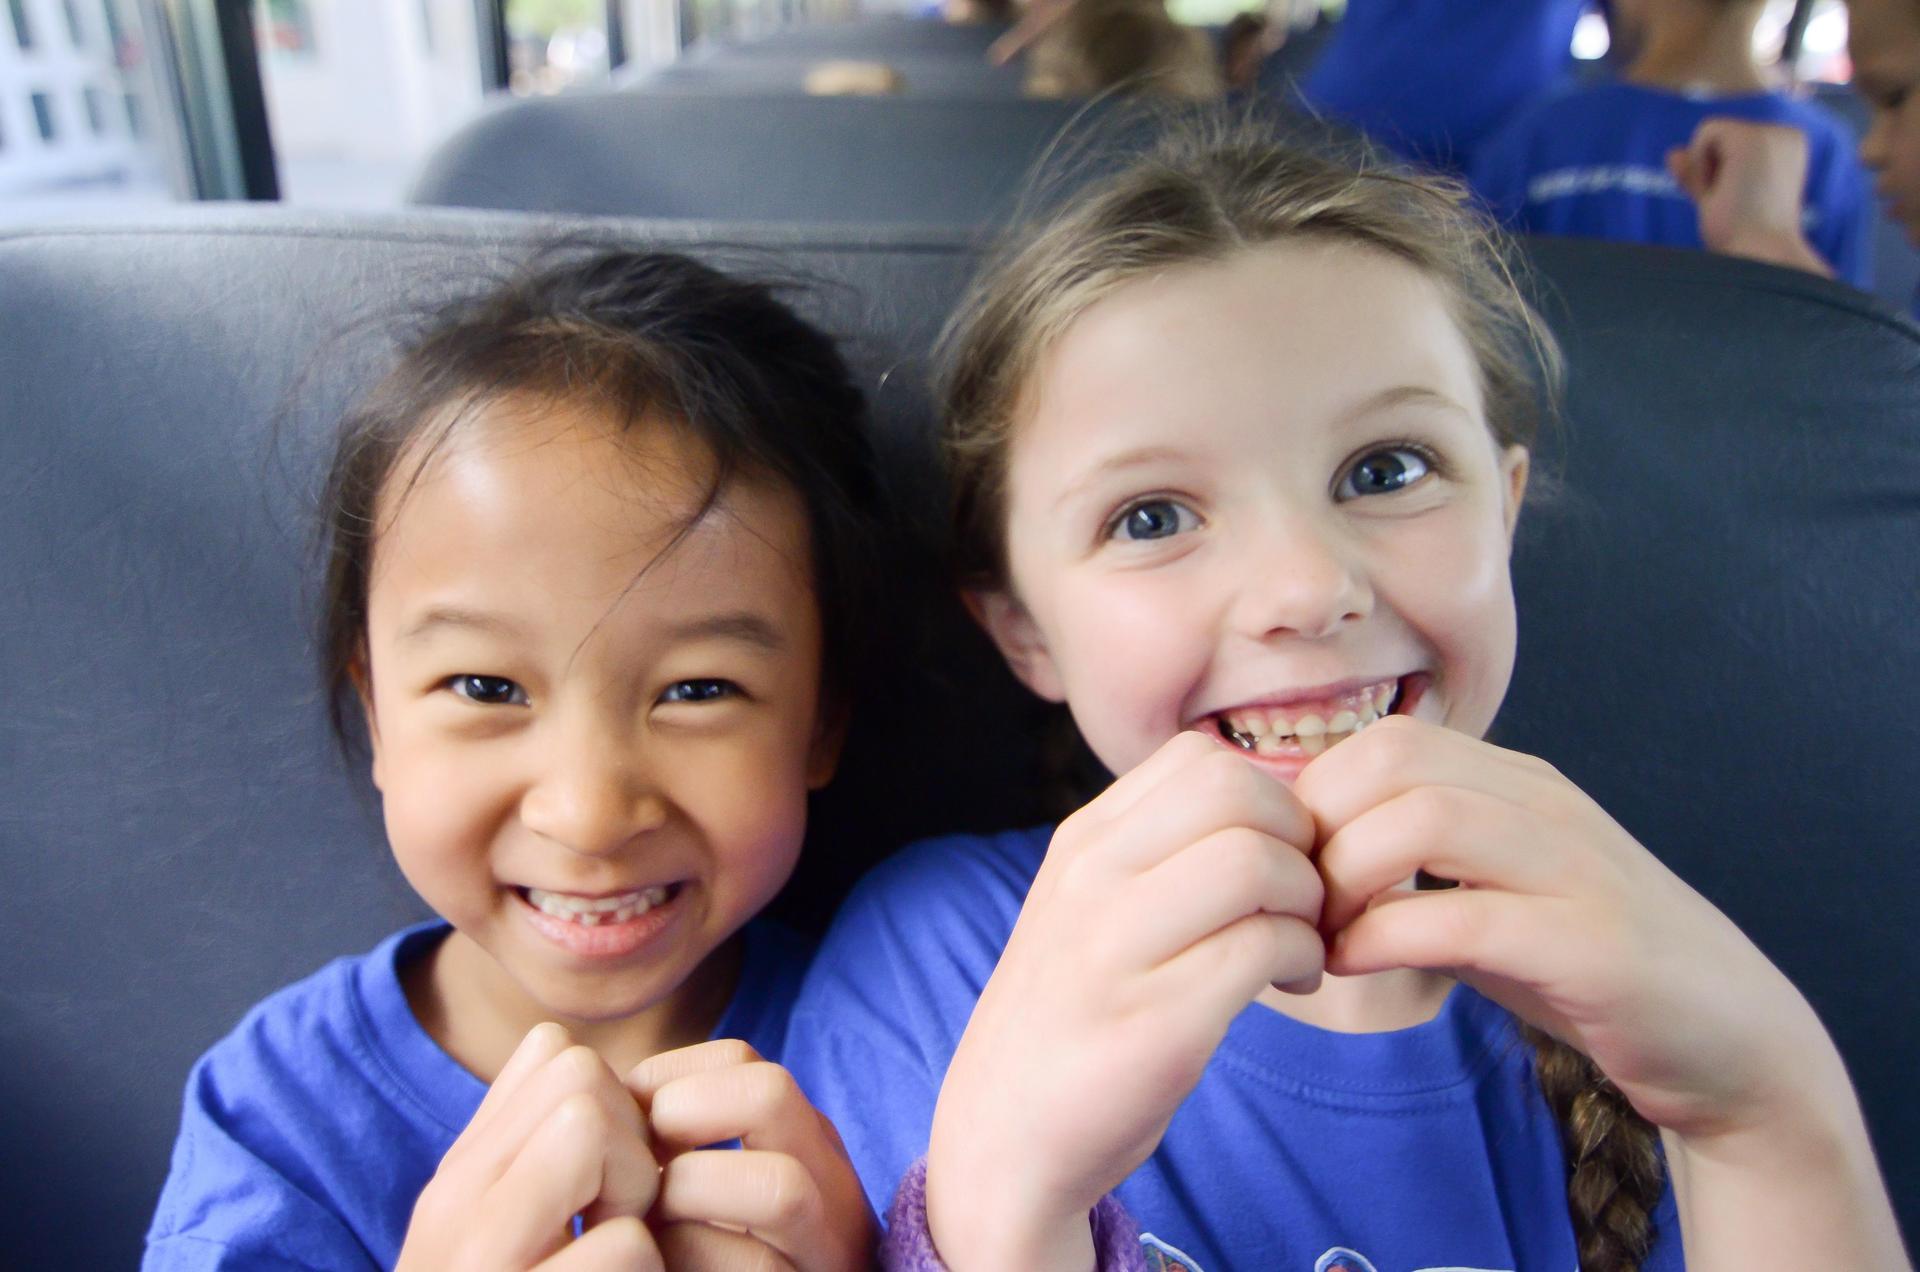 Two girls on school bus